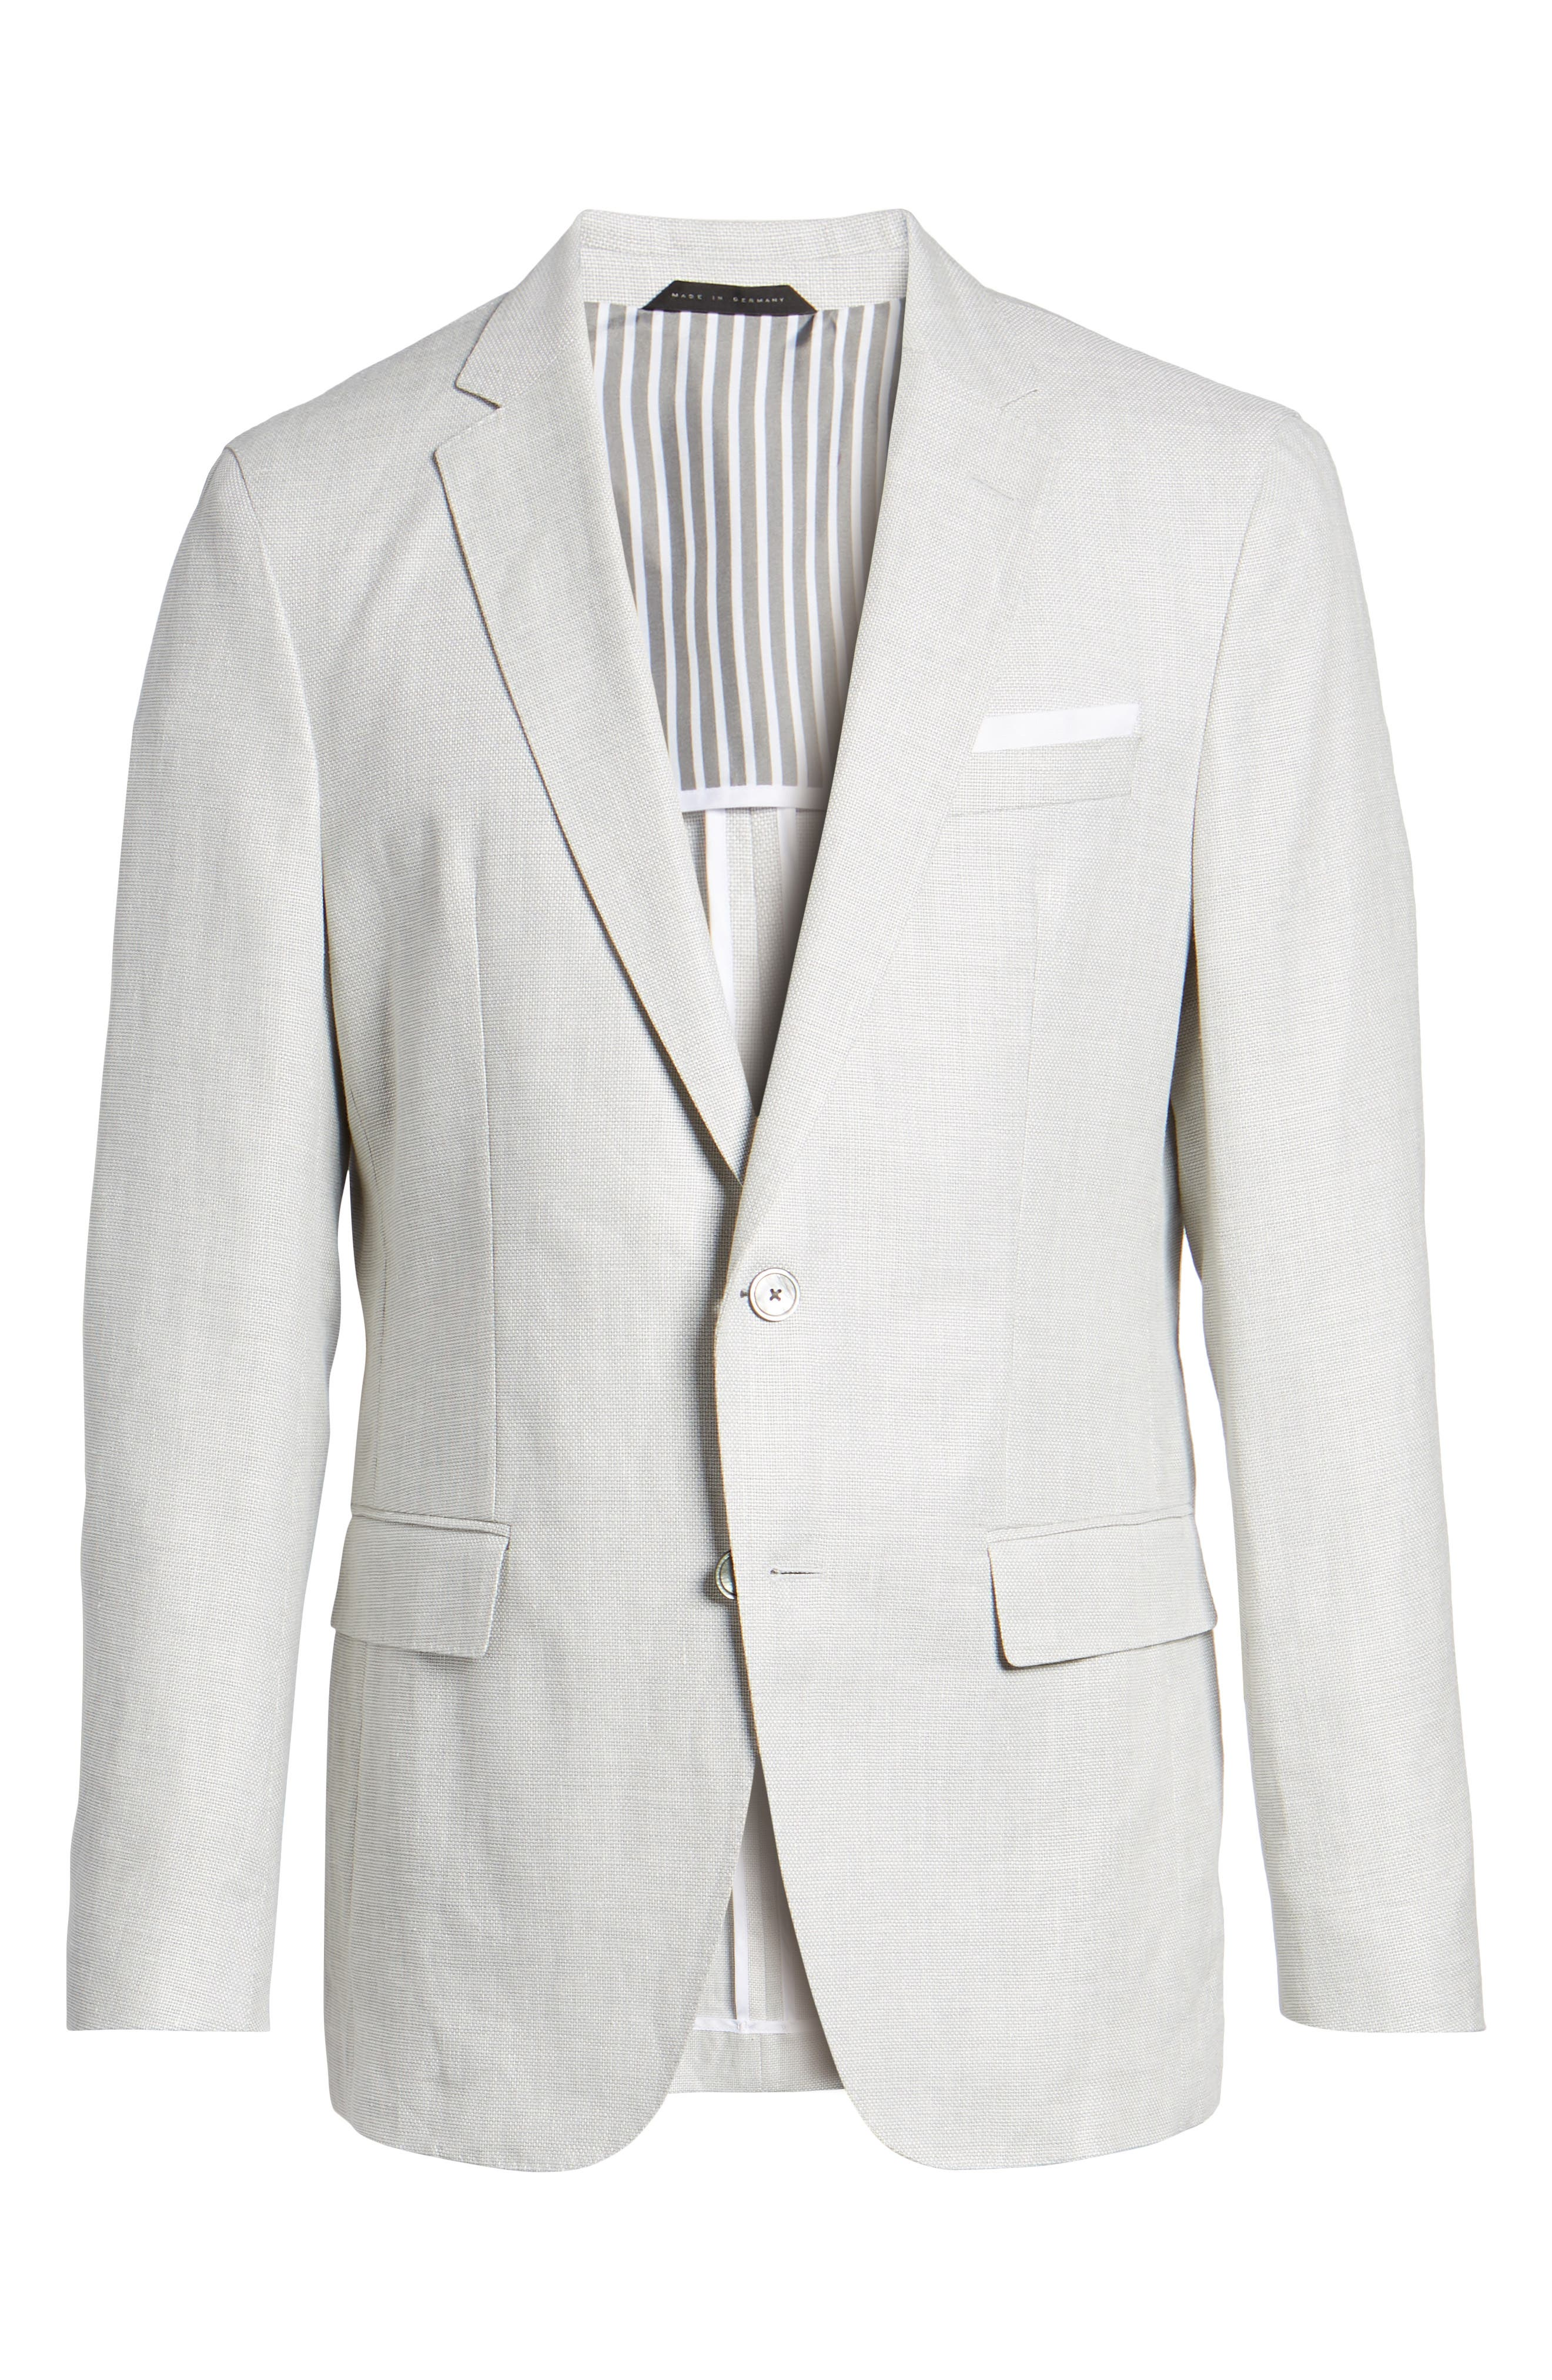 Hartlay Trim Fit Linen Blend Blazer,                             Alternate thumbnail 6, color,                             Silver Grey